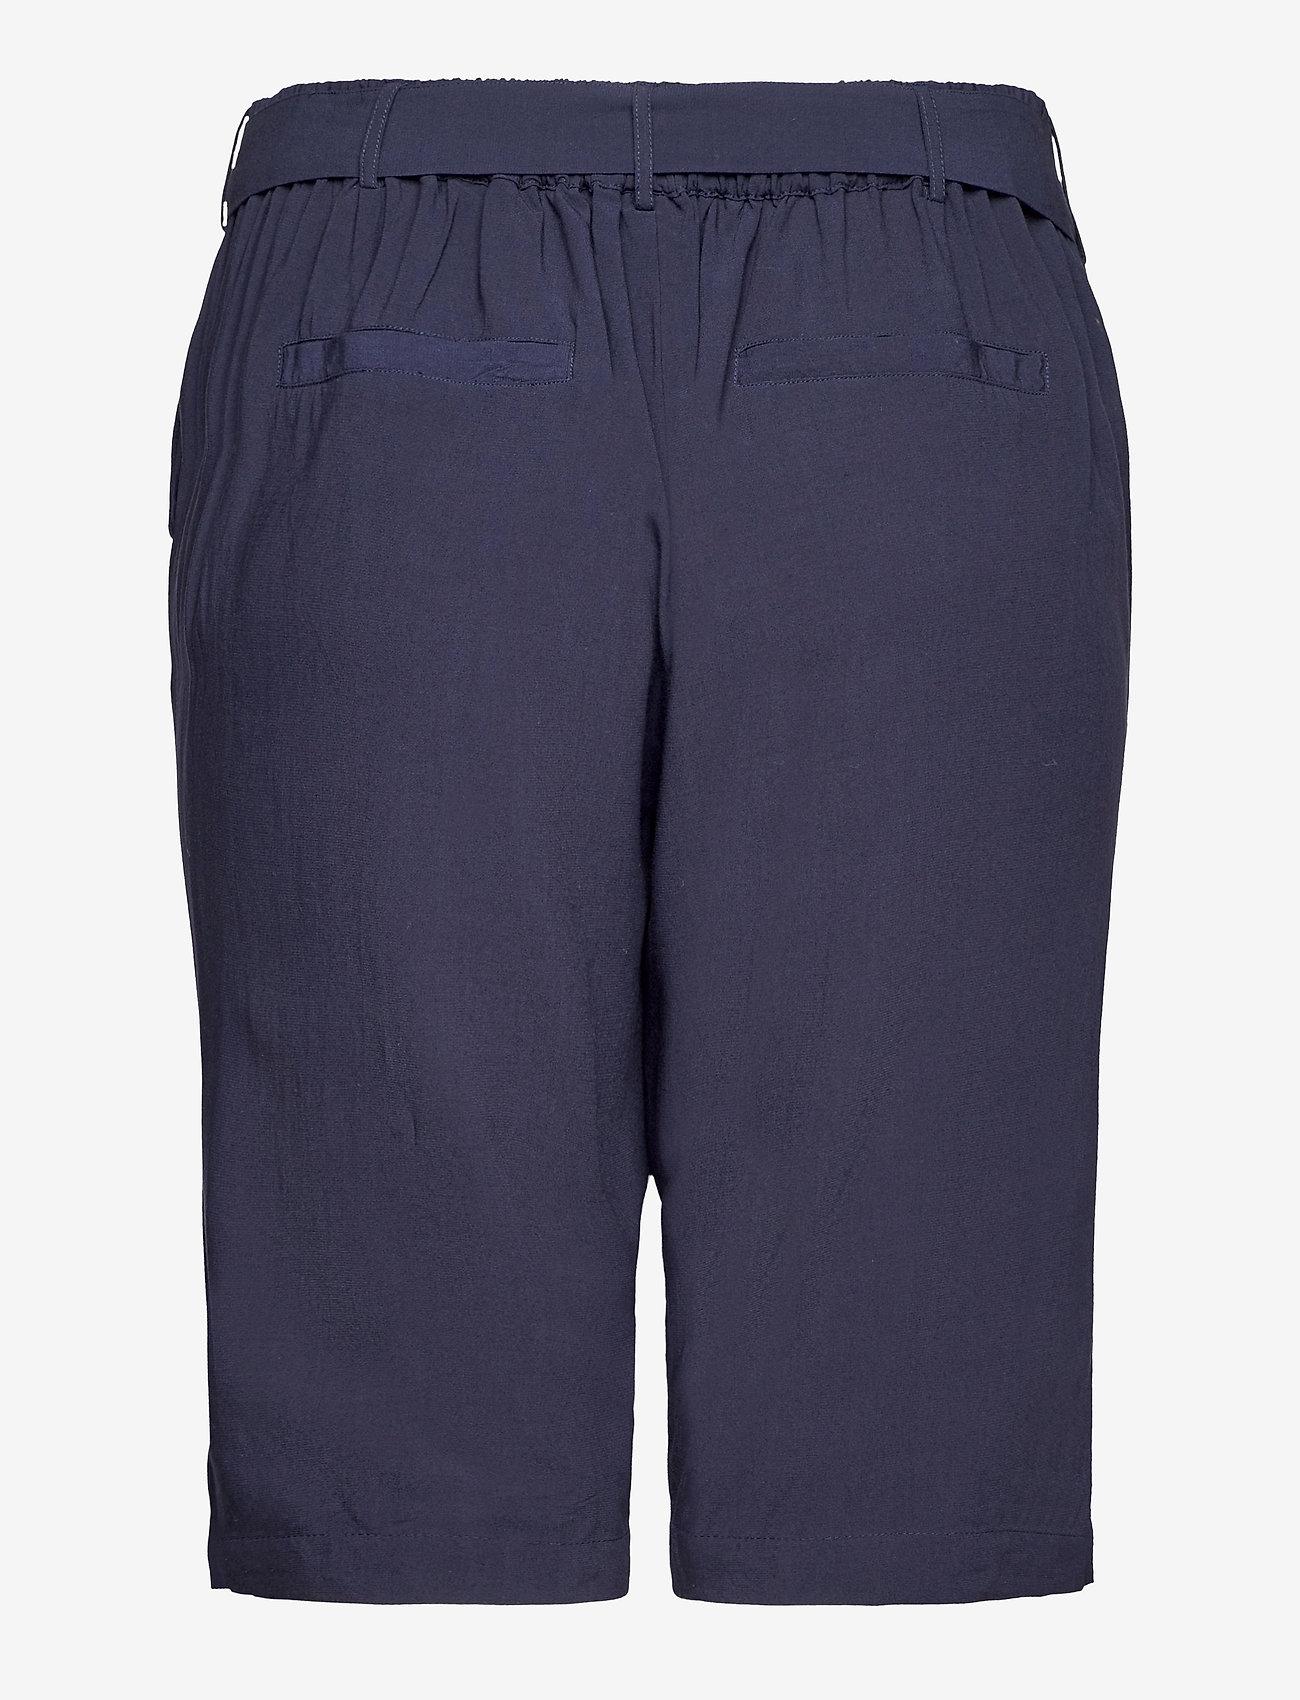 Zizzi - MABHI, SHORTS - bermudas - dark blue - 1